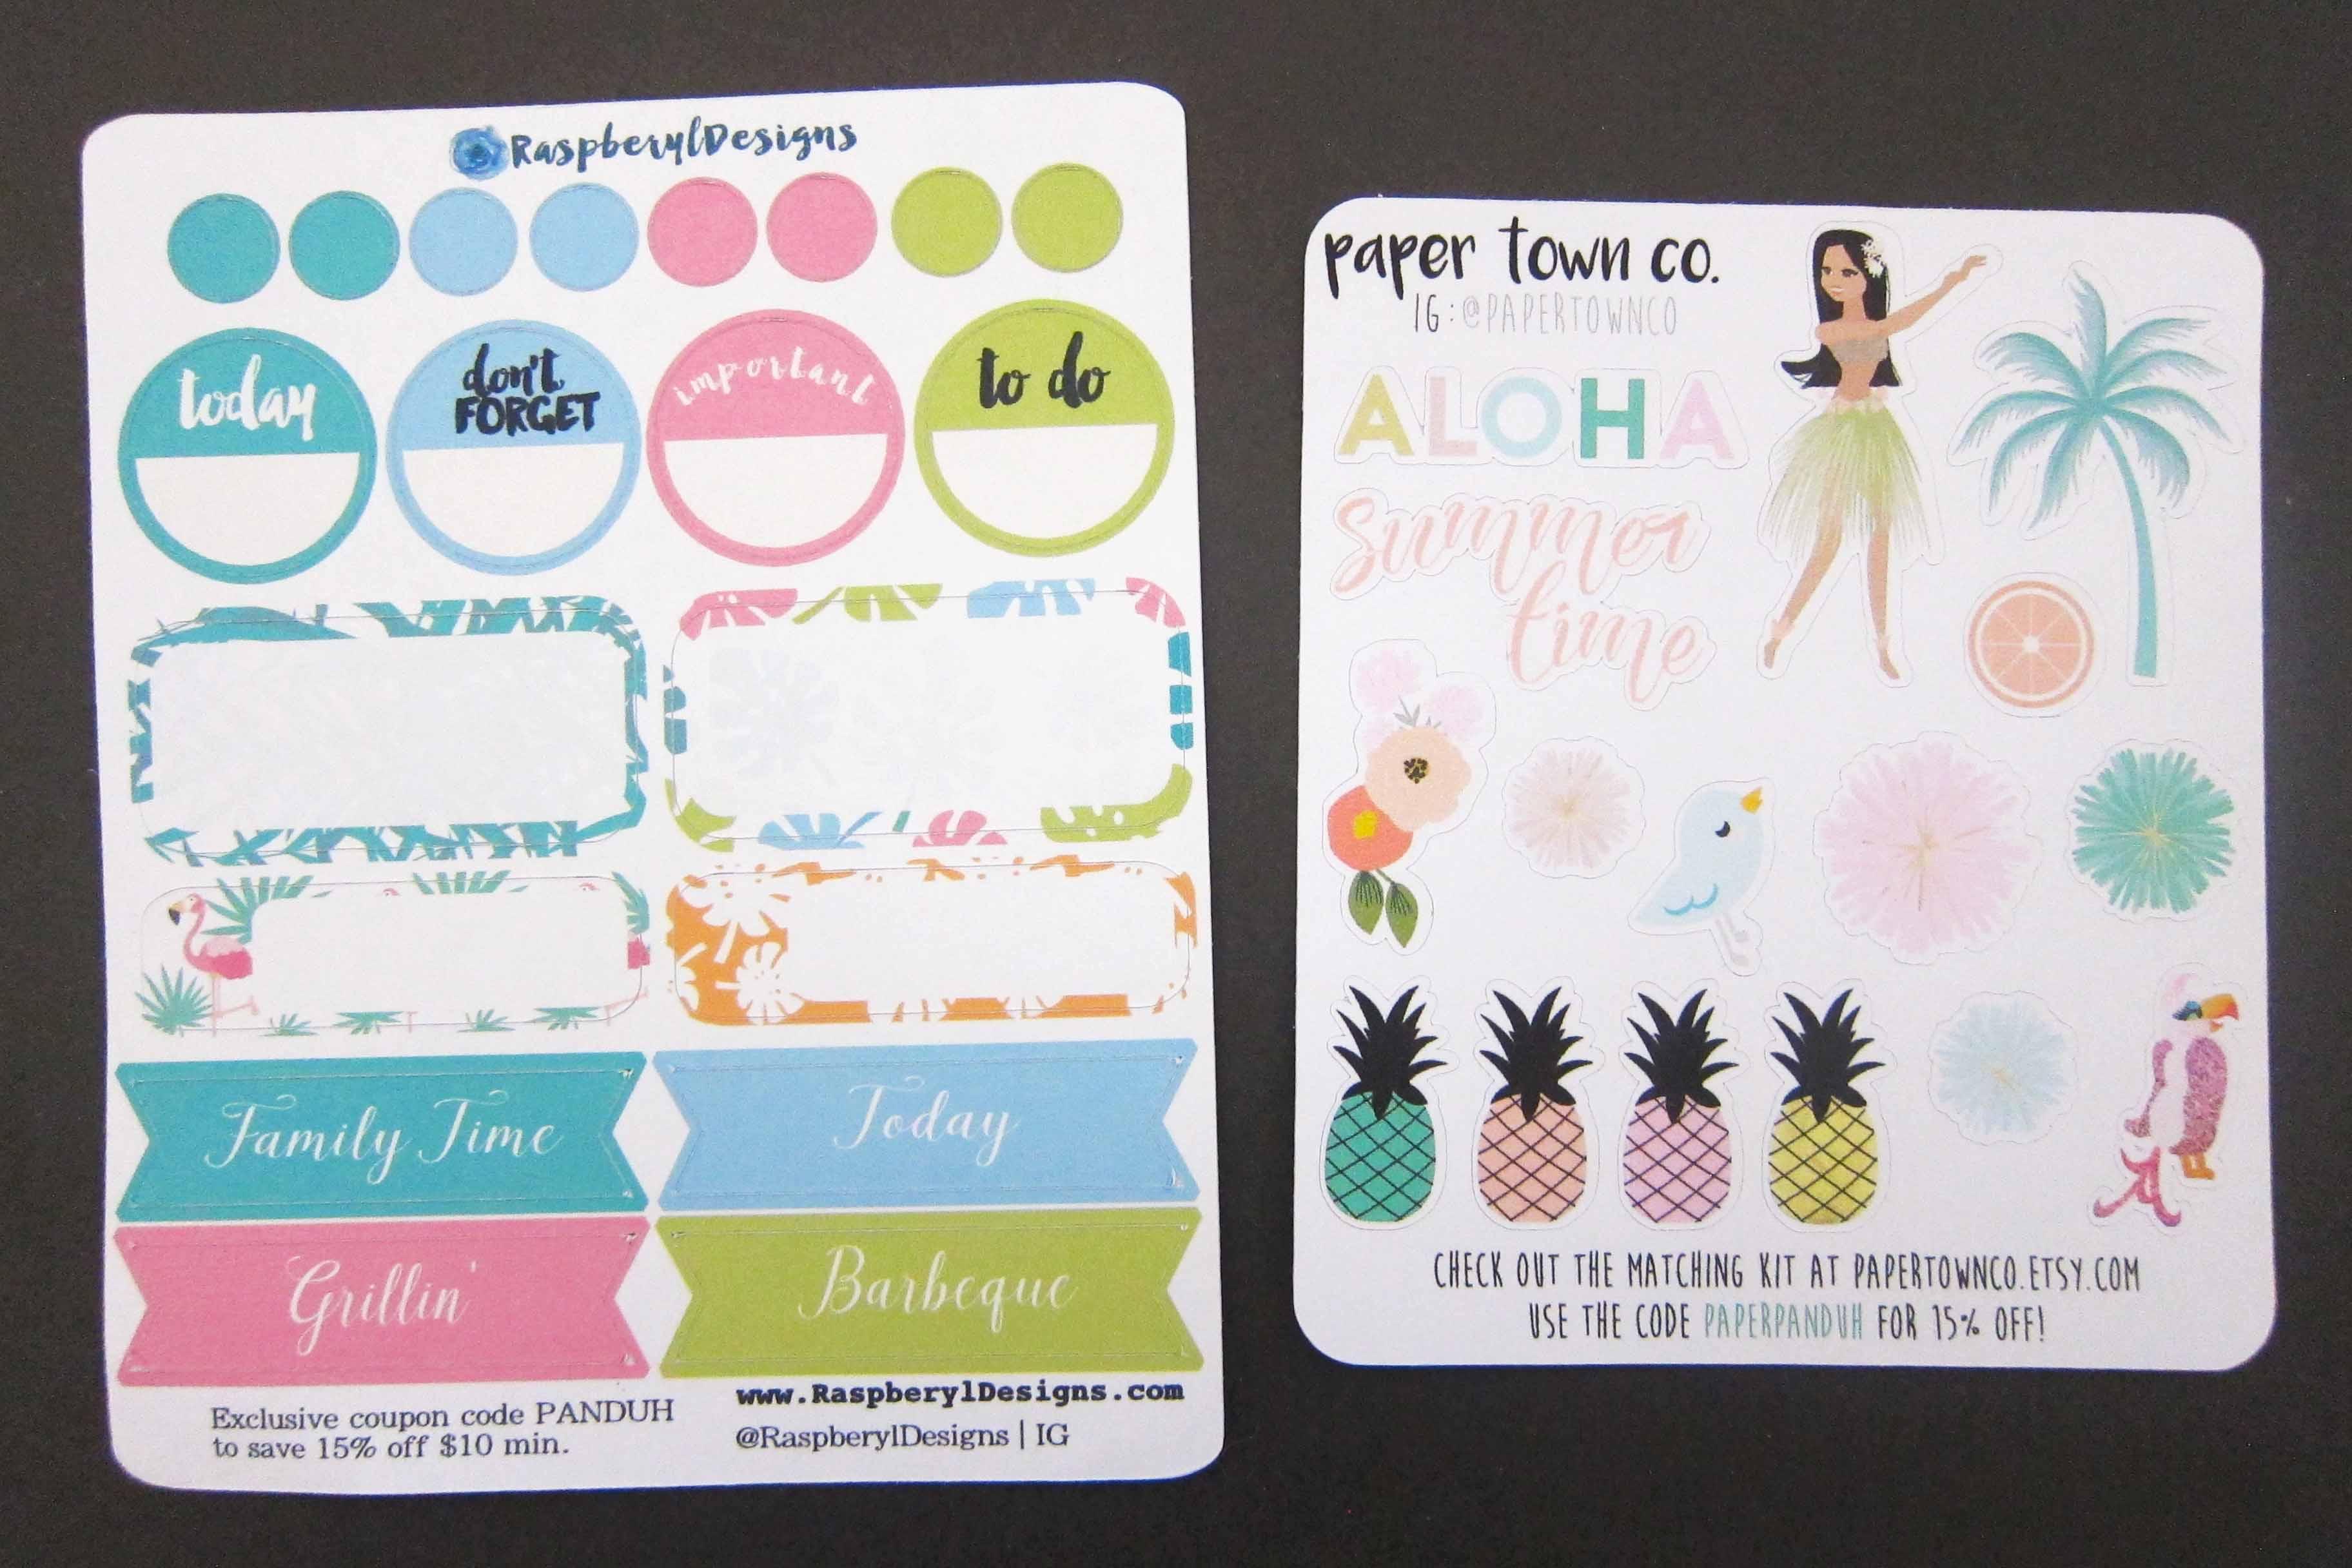 Panduh Box June 2016 Raspberyl Designs Paper Town Co. Stickers